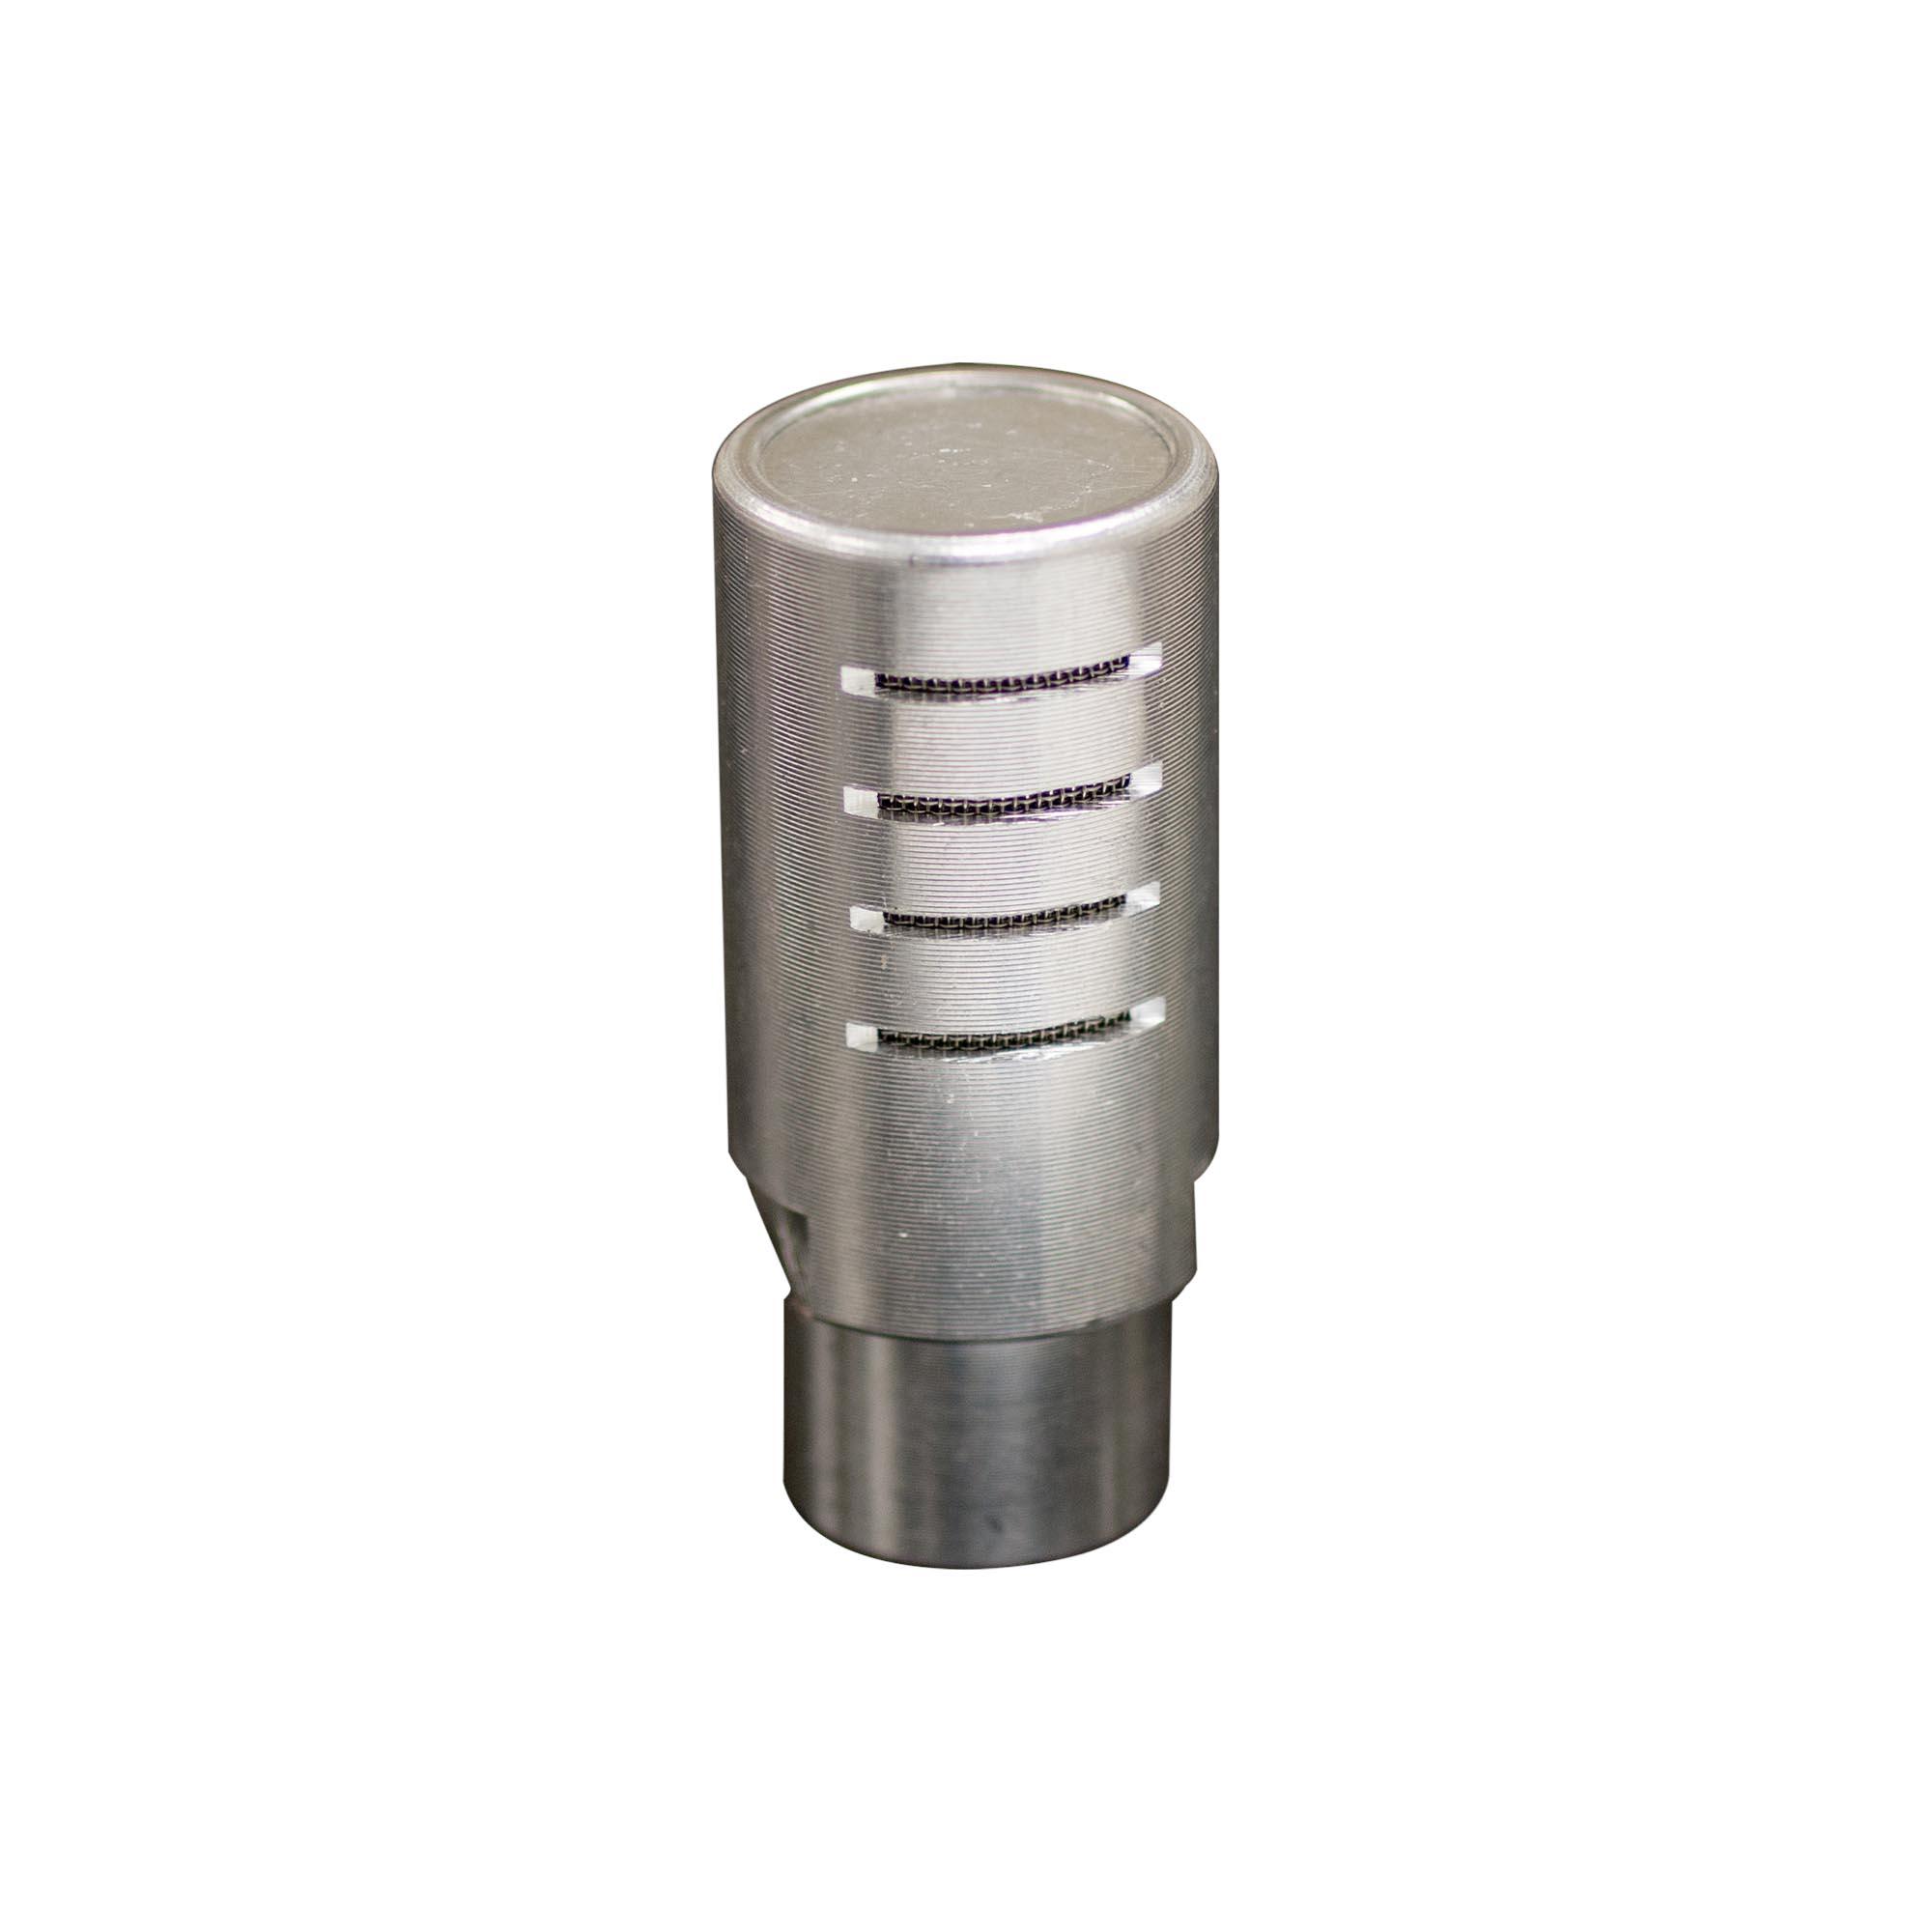 Model 3903 Hot Muffler for Small and Medium  2-40 SCFM Vortex Tubes